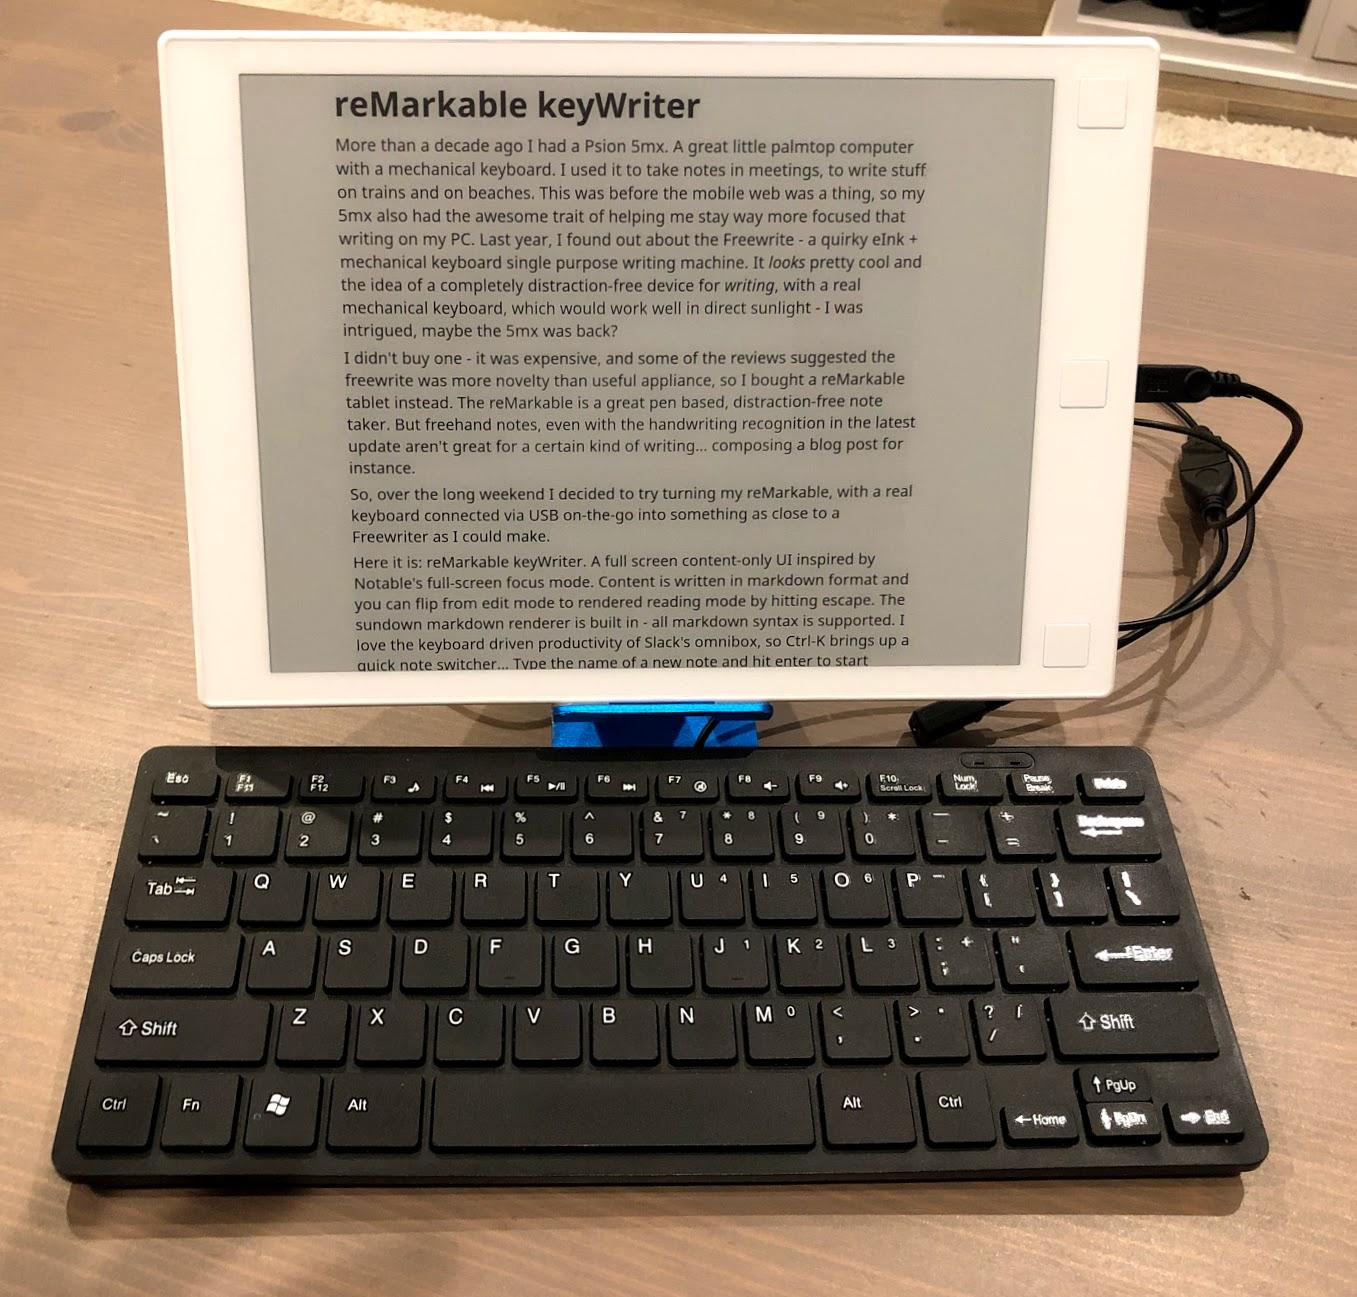 Image of reMarkable keyWriter